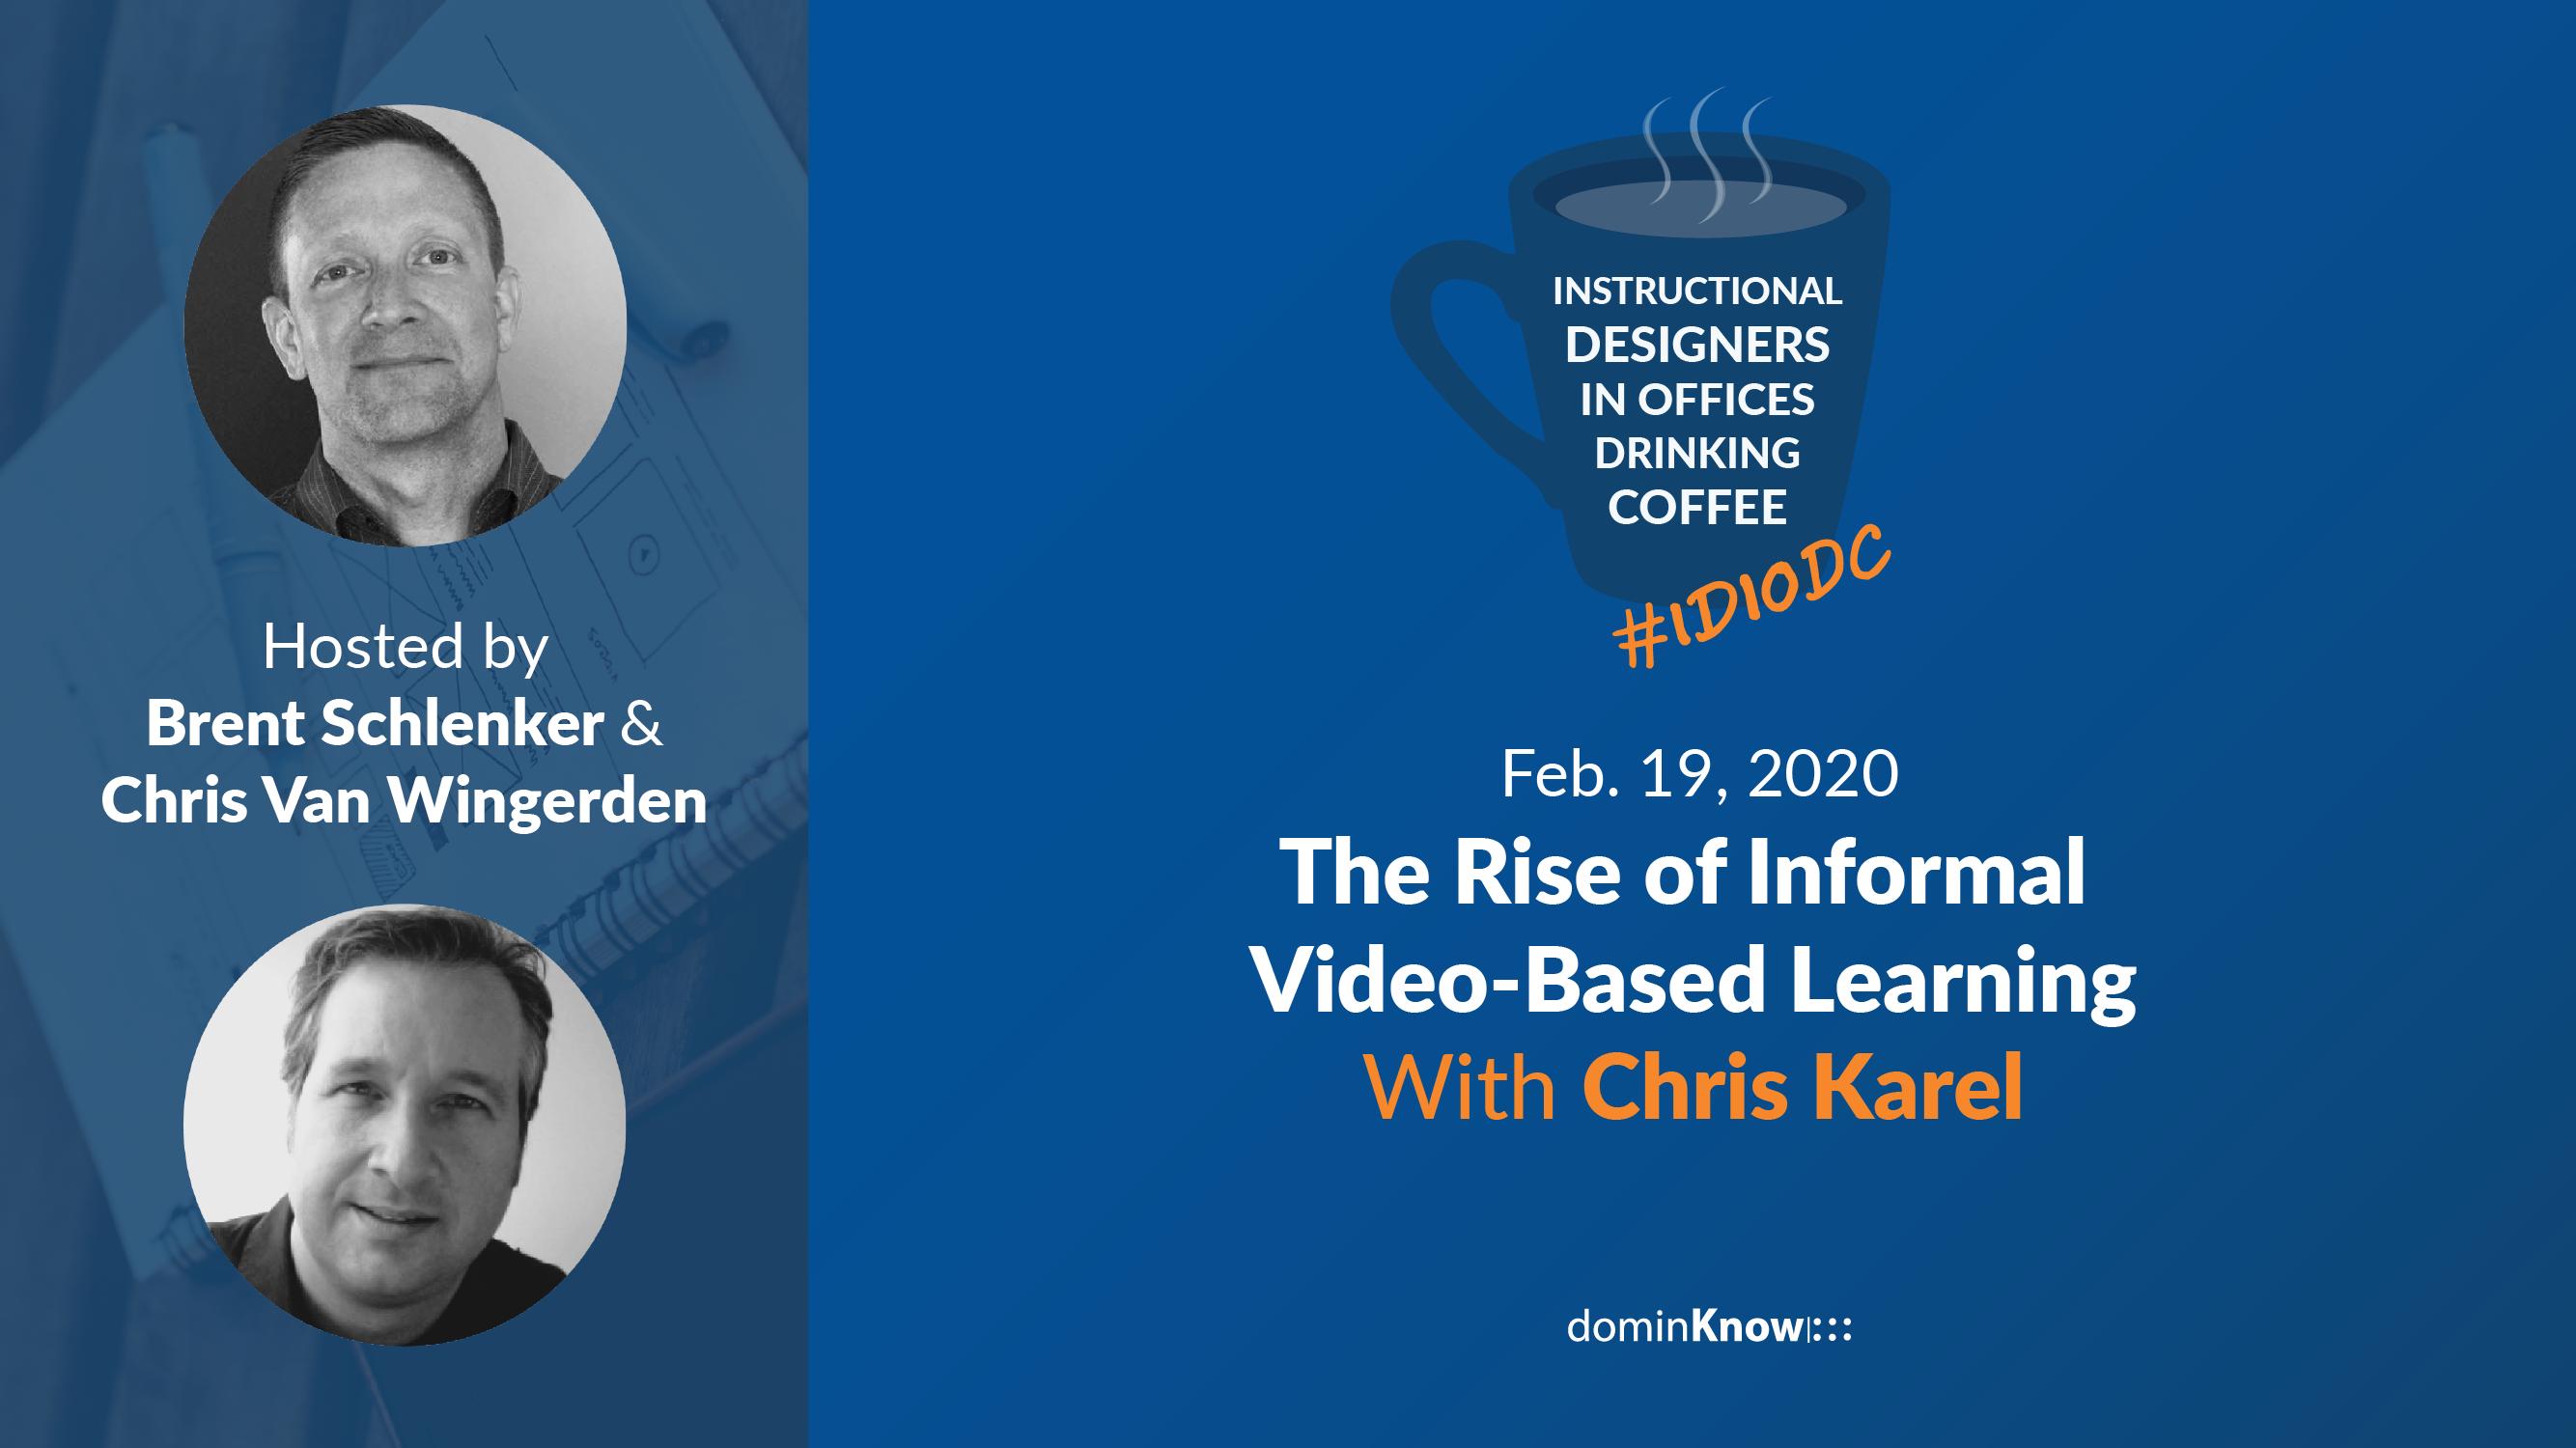 Chris Van Wingerden and Brent Schlenker go live with special guest Chris Karel to talk video-based informal learning.